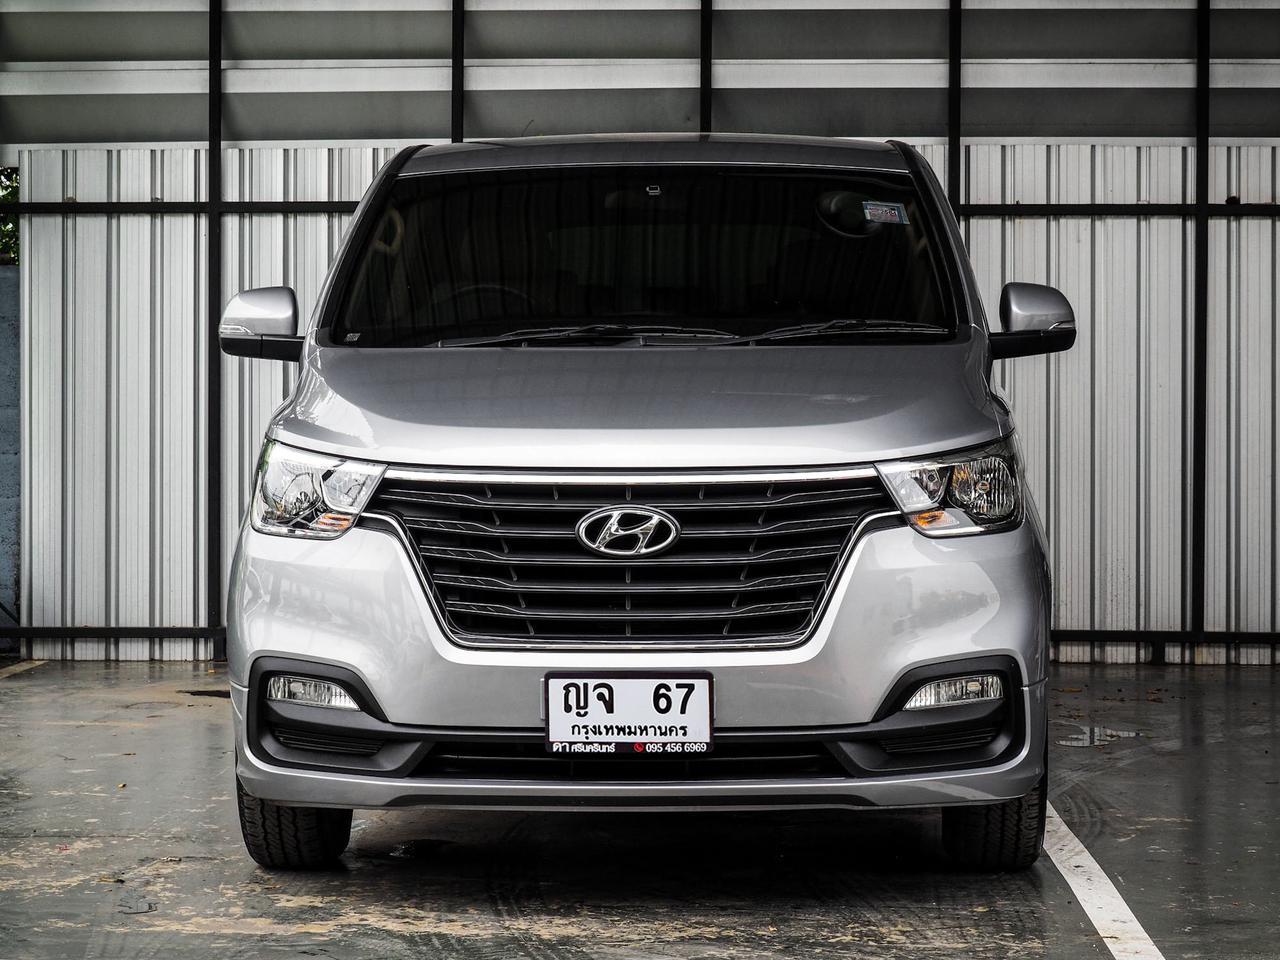 Hyundai H1 Touring โฉมปัจจุบัน ปี 2019 เลขไมล์ 30,000 กิโล รูปที่ 2